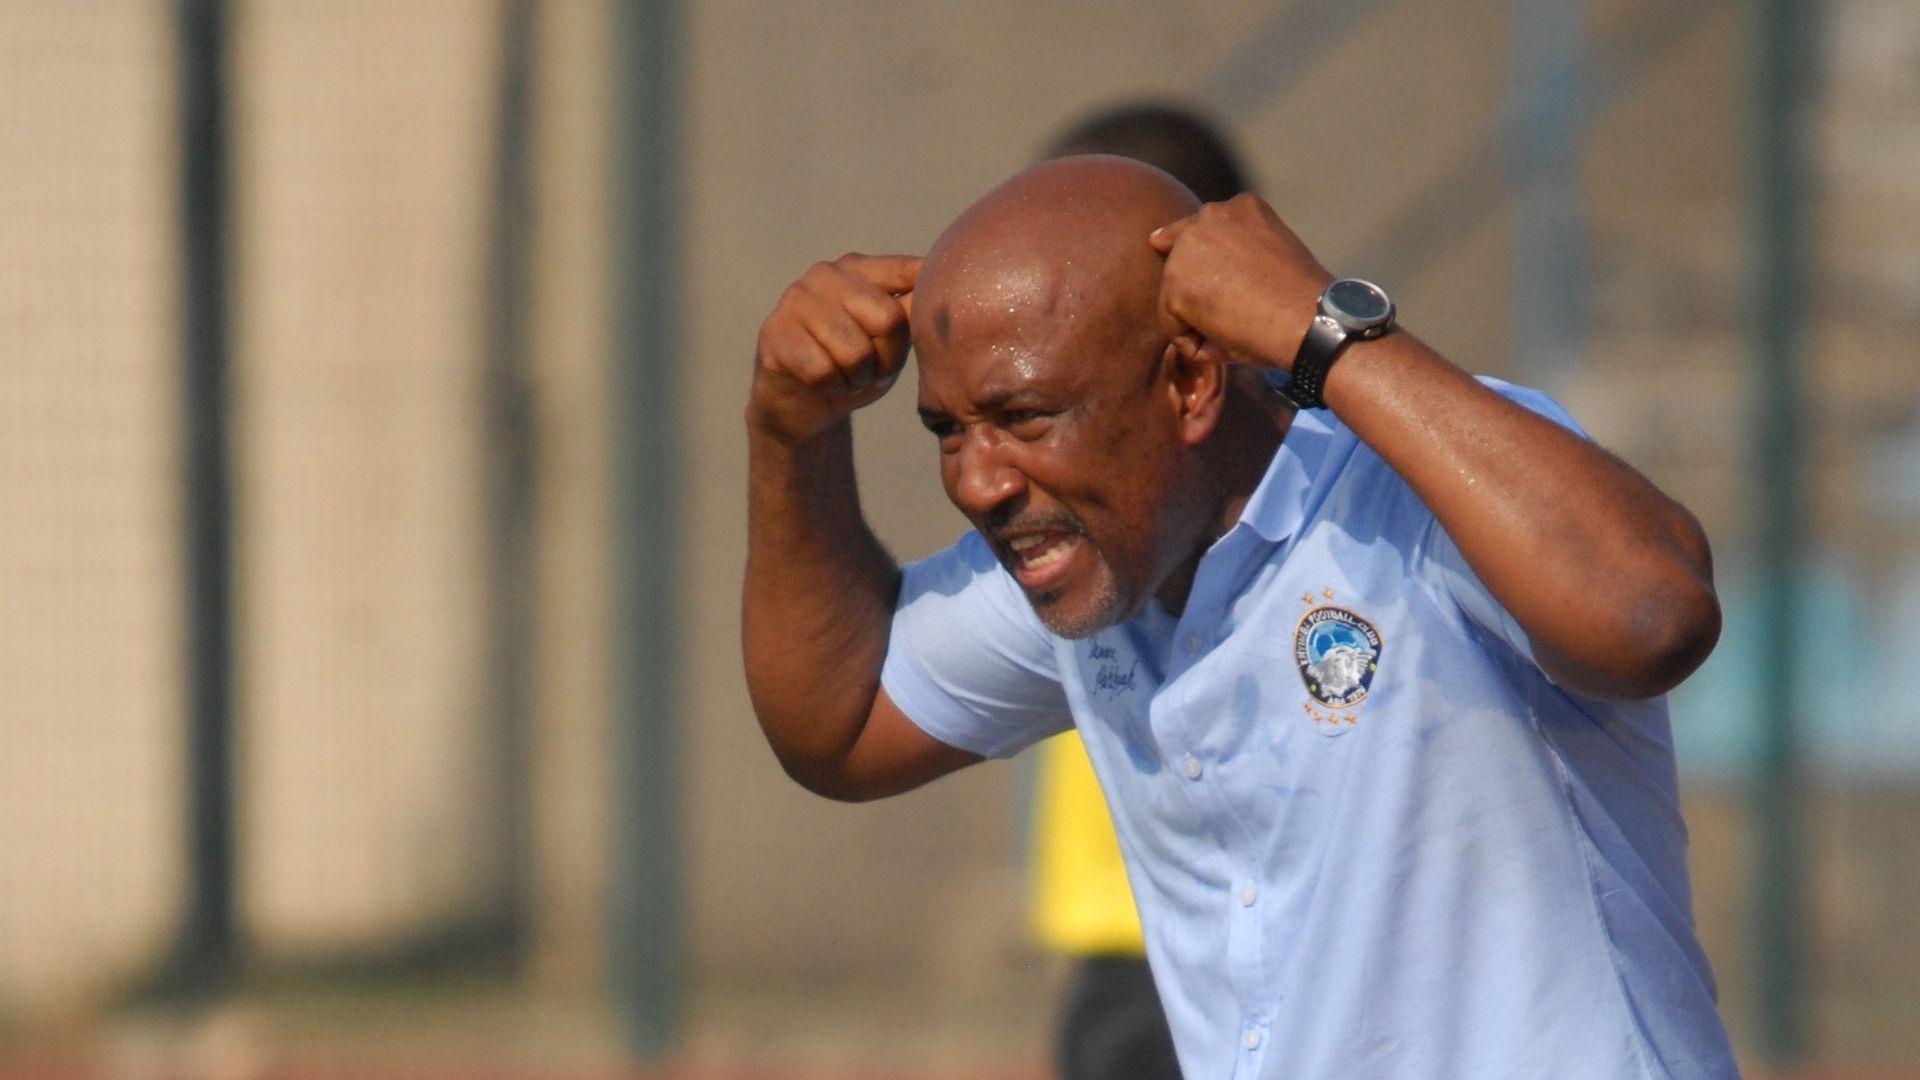 enyimba usman abdallah 1bxqoakolhdyk1ptsg55q5mkar - Enyimba FC axe Usman Abd'allah as Technical Adviser